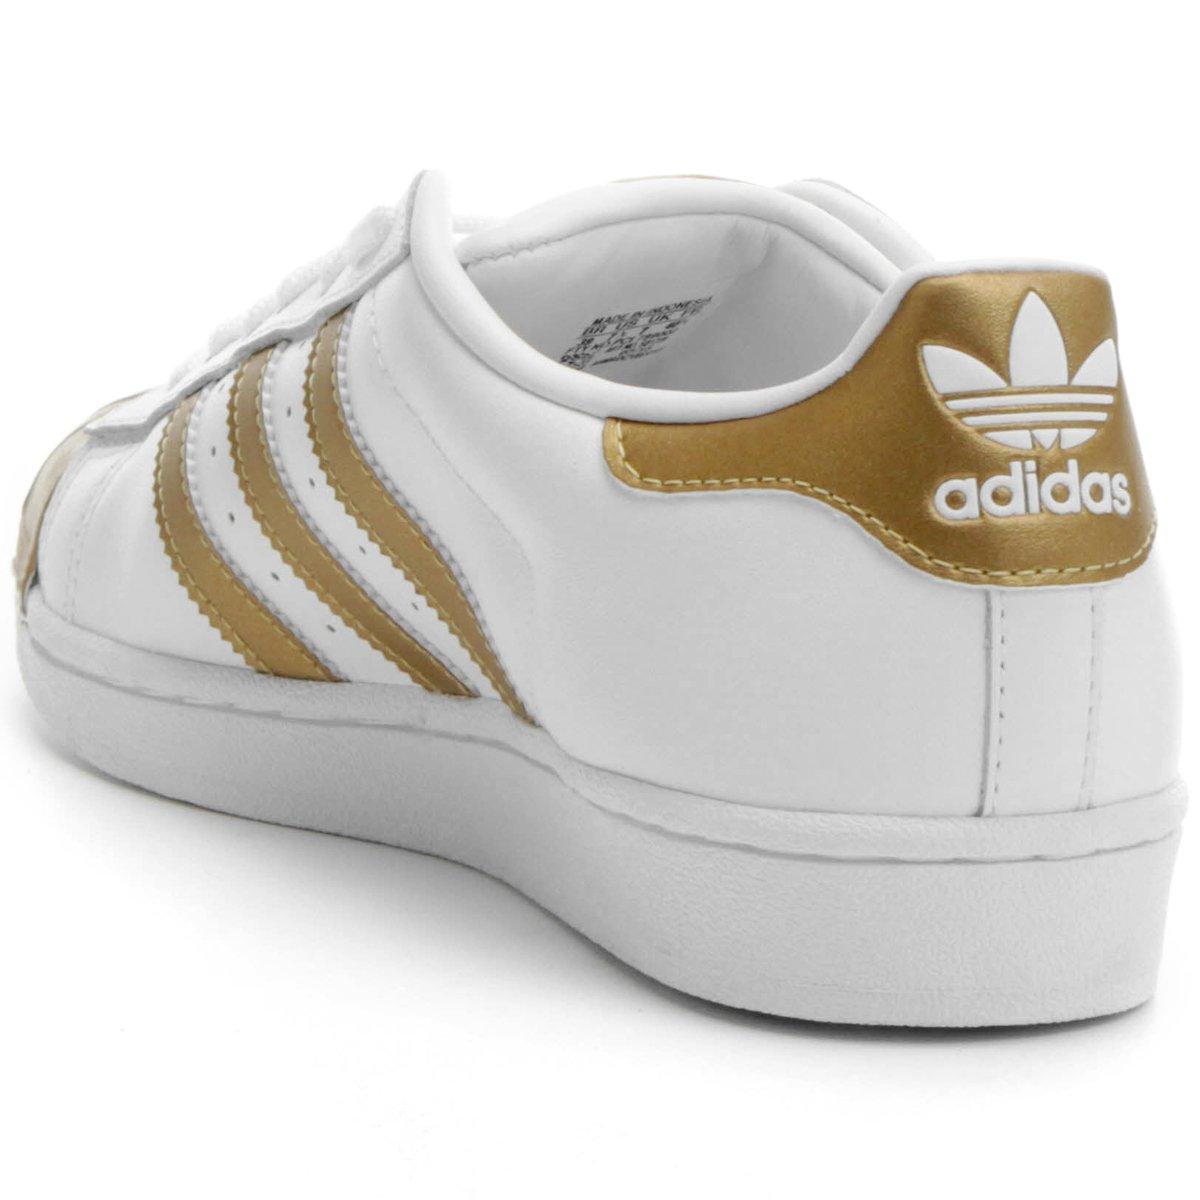 a13508411a Tênis Adidas Superstar Metallic - Compre Agora